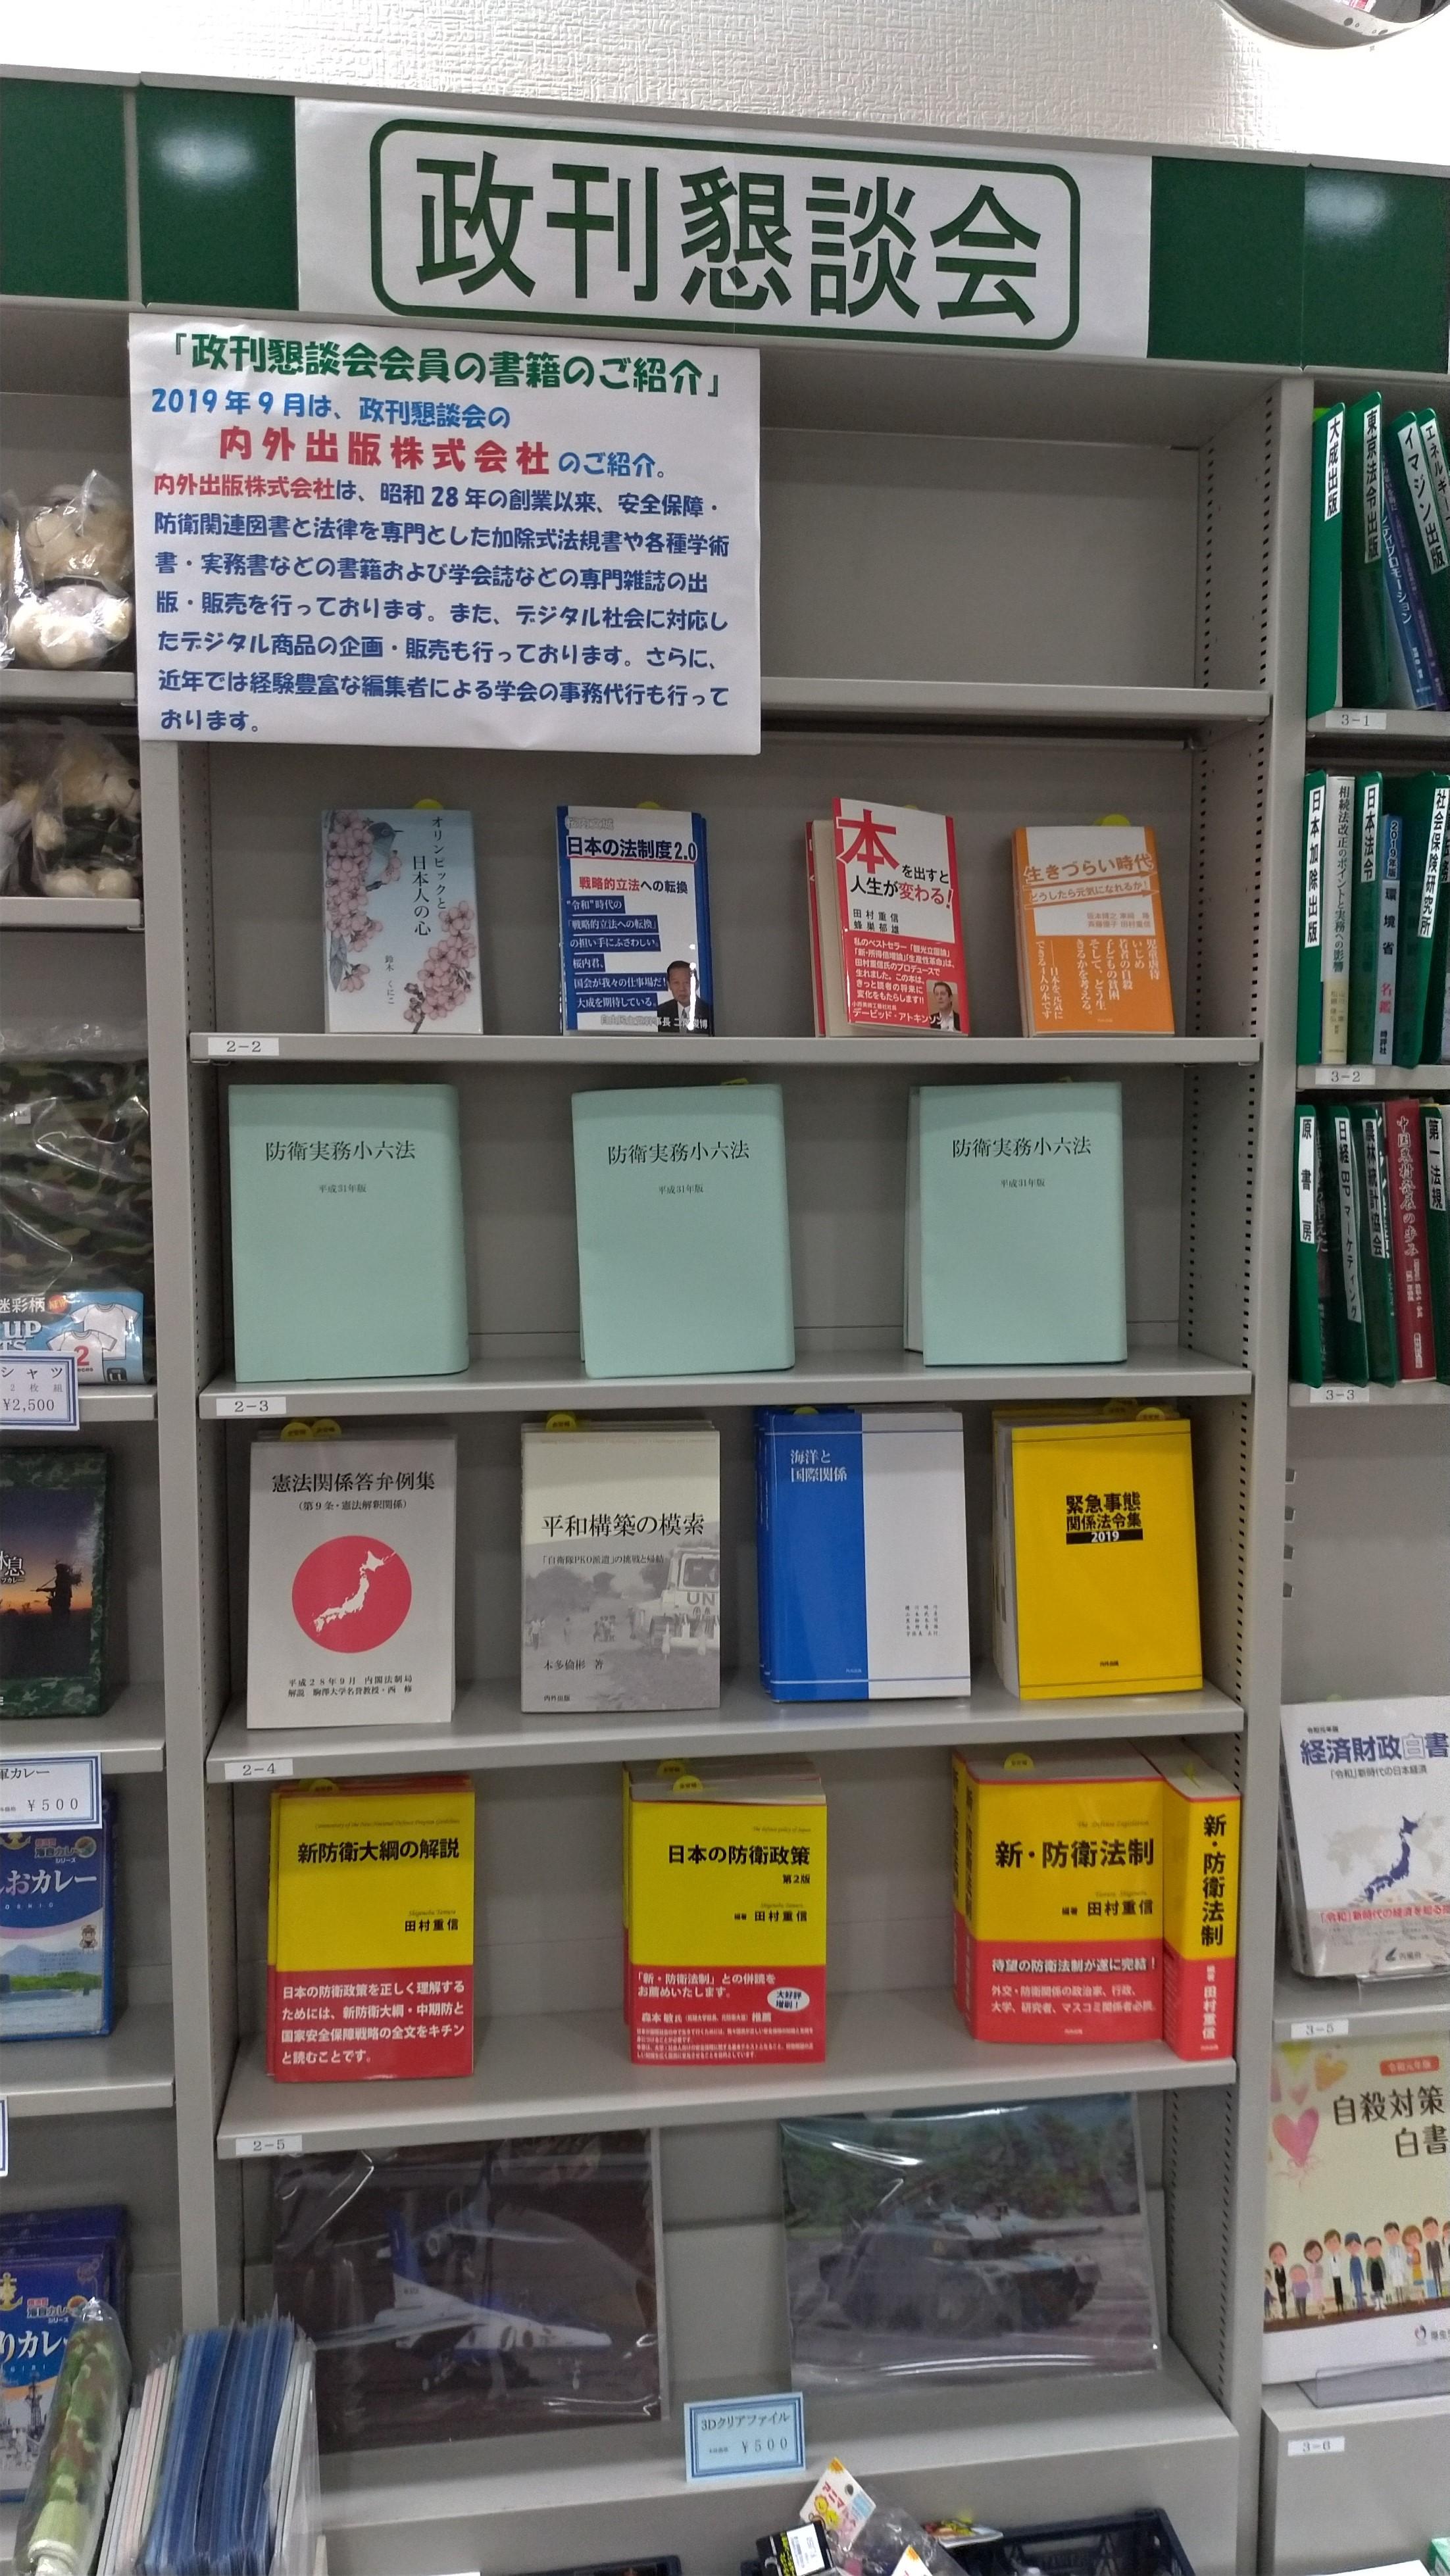 http://www.naigai-group.co.jp/ichigaya/books-img/P_20190911_131905_vHDR_Auto.jpg